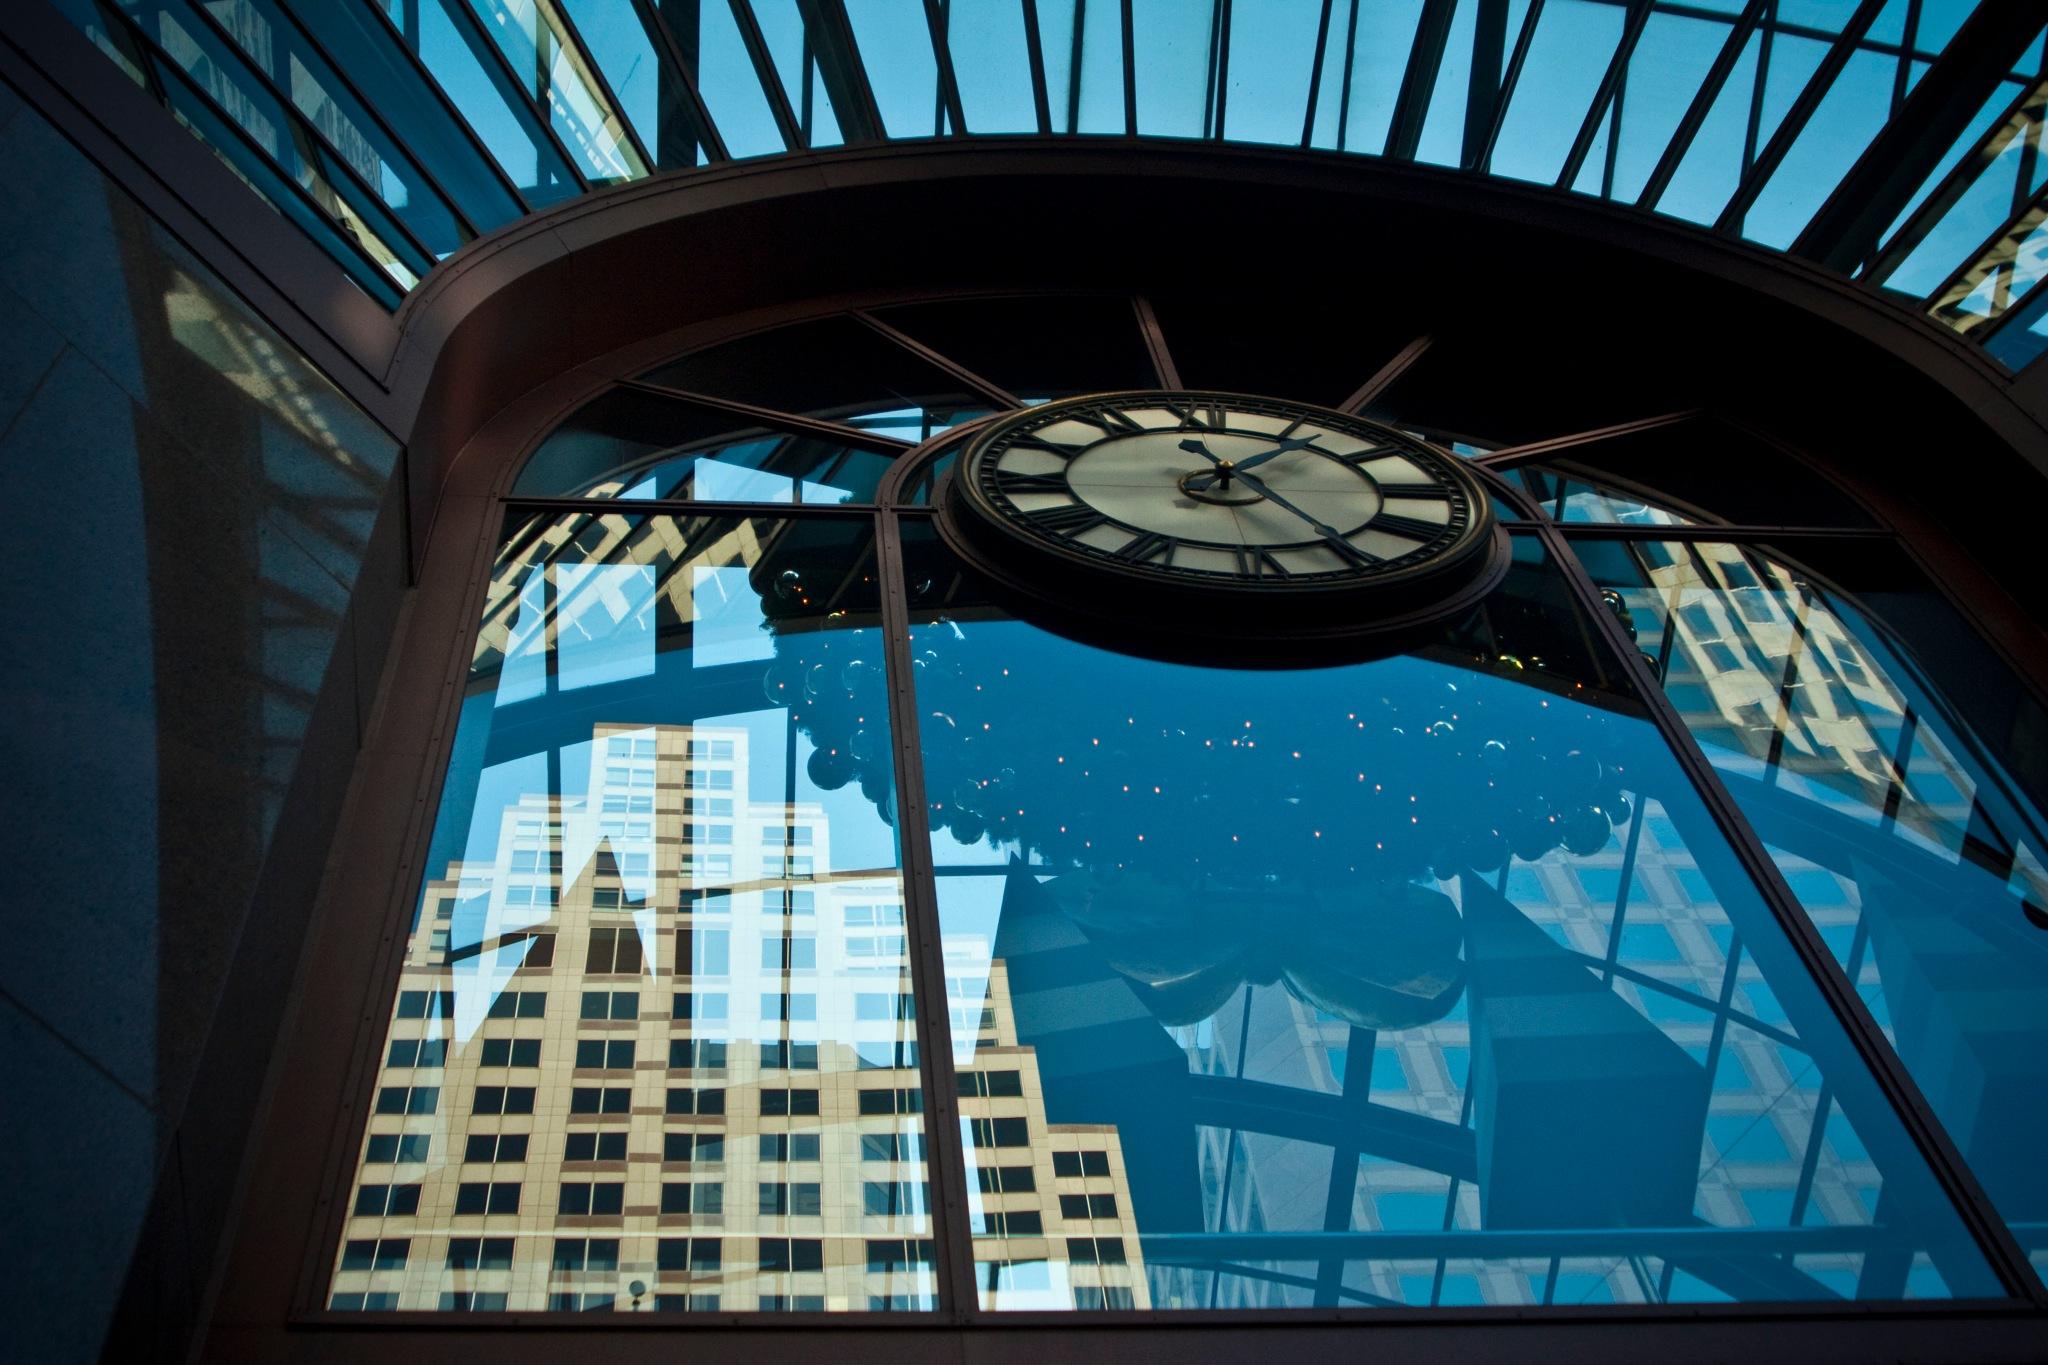 SF city reflections. by metafizics